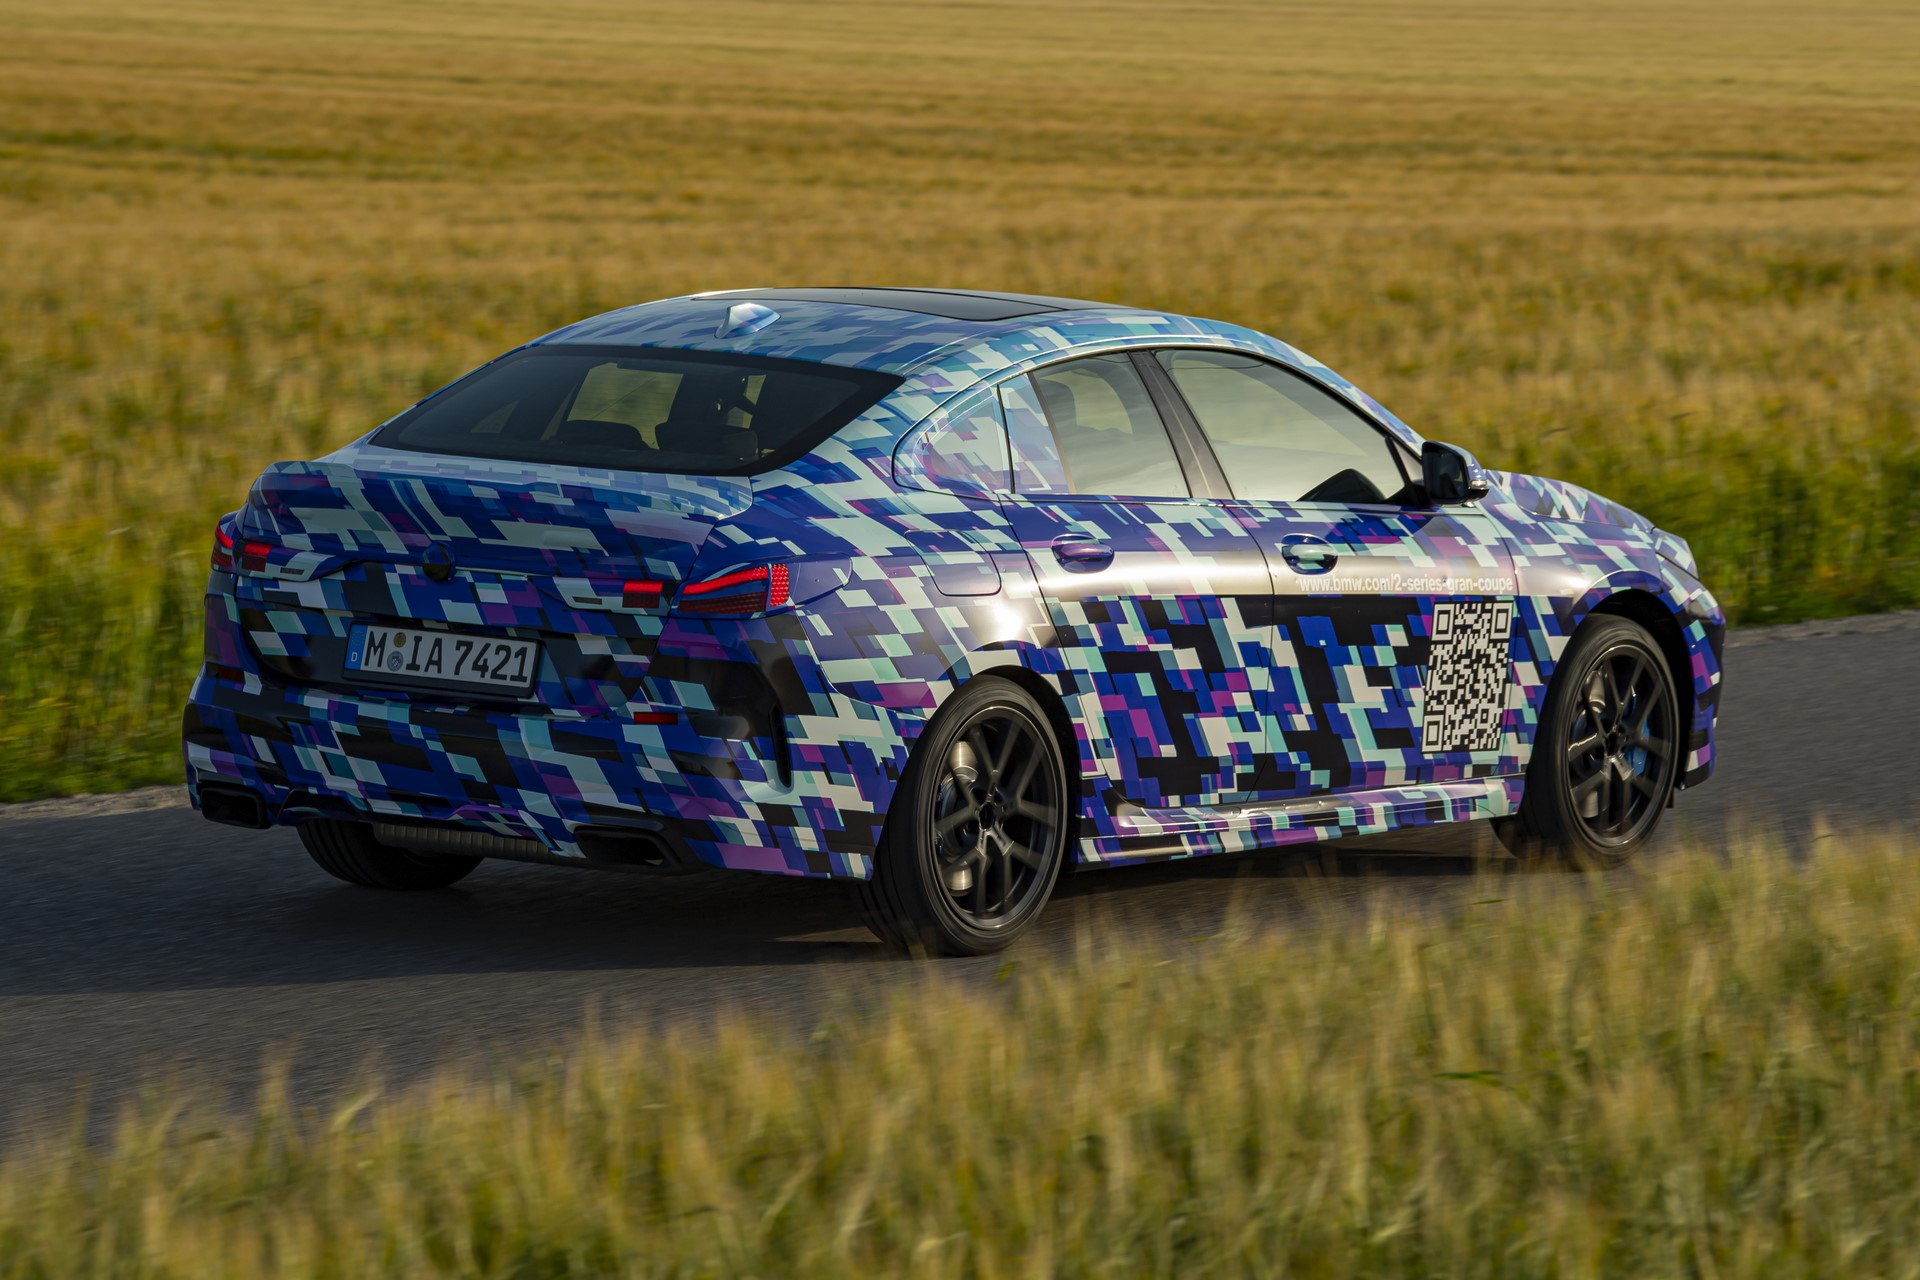 BMW-2-Series-Gran-Coupe-2020-spy-photos-14